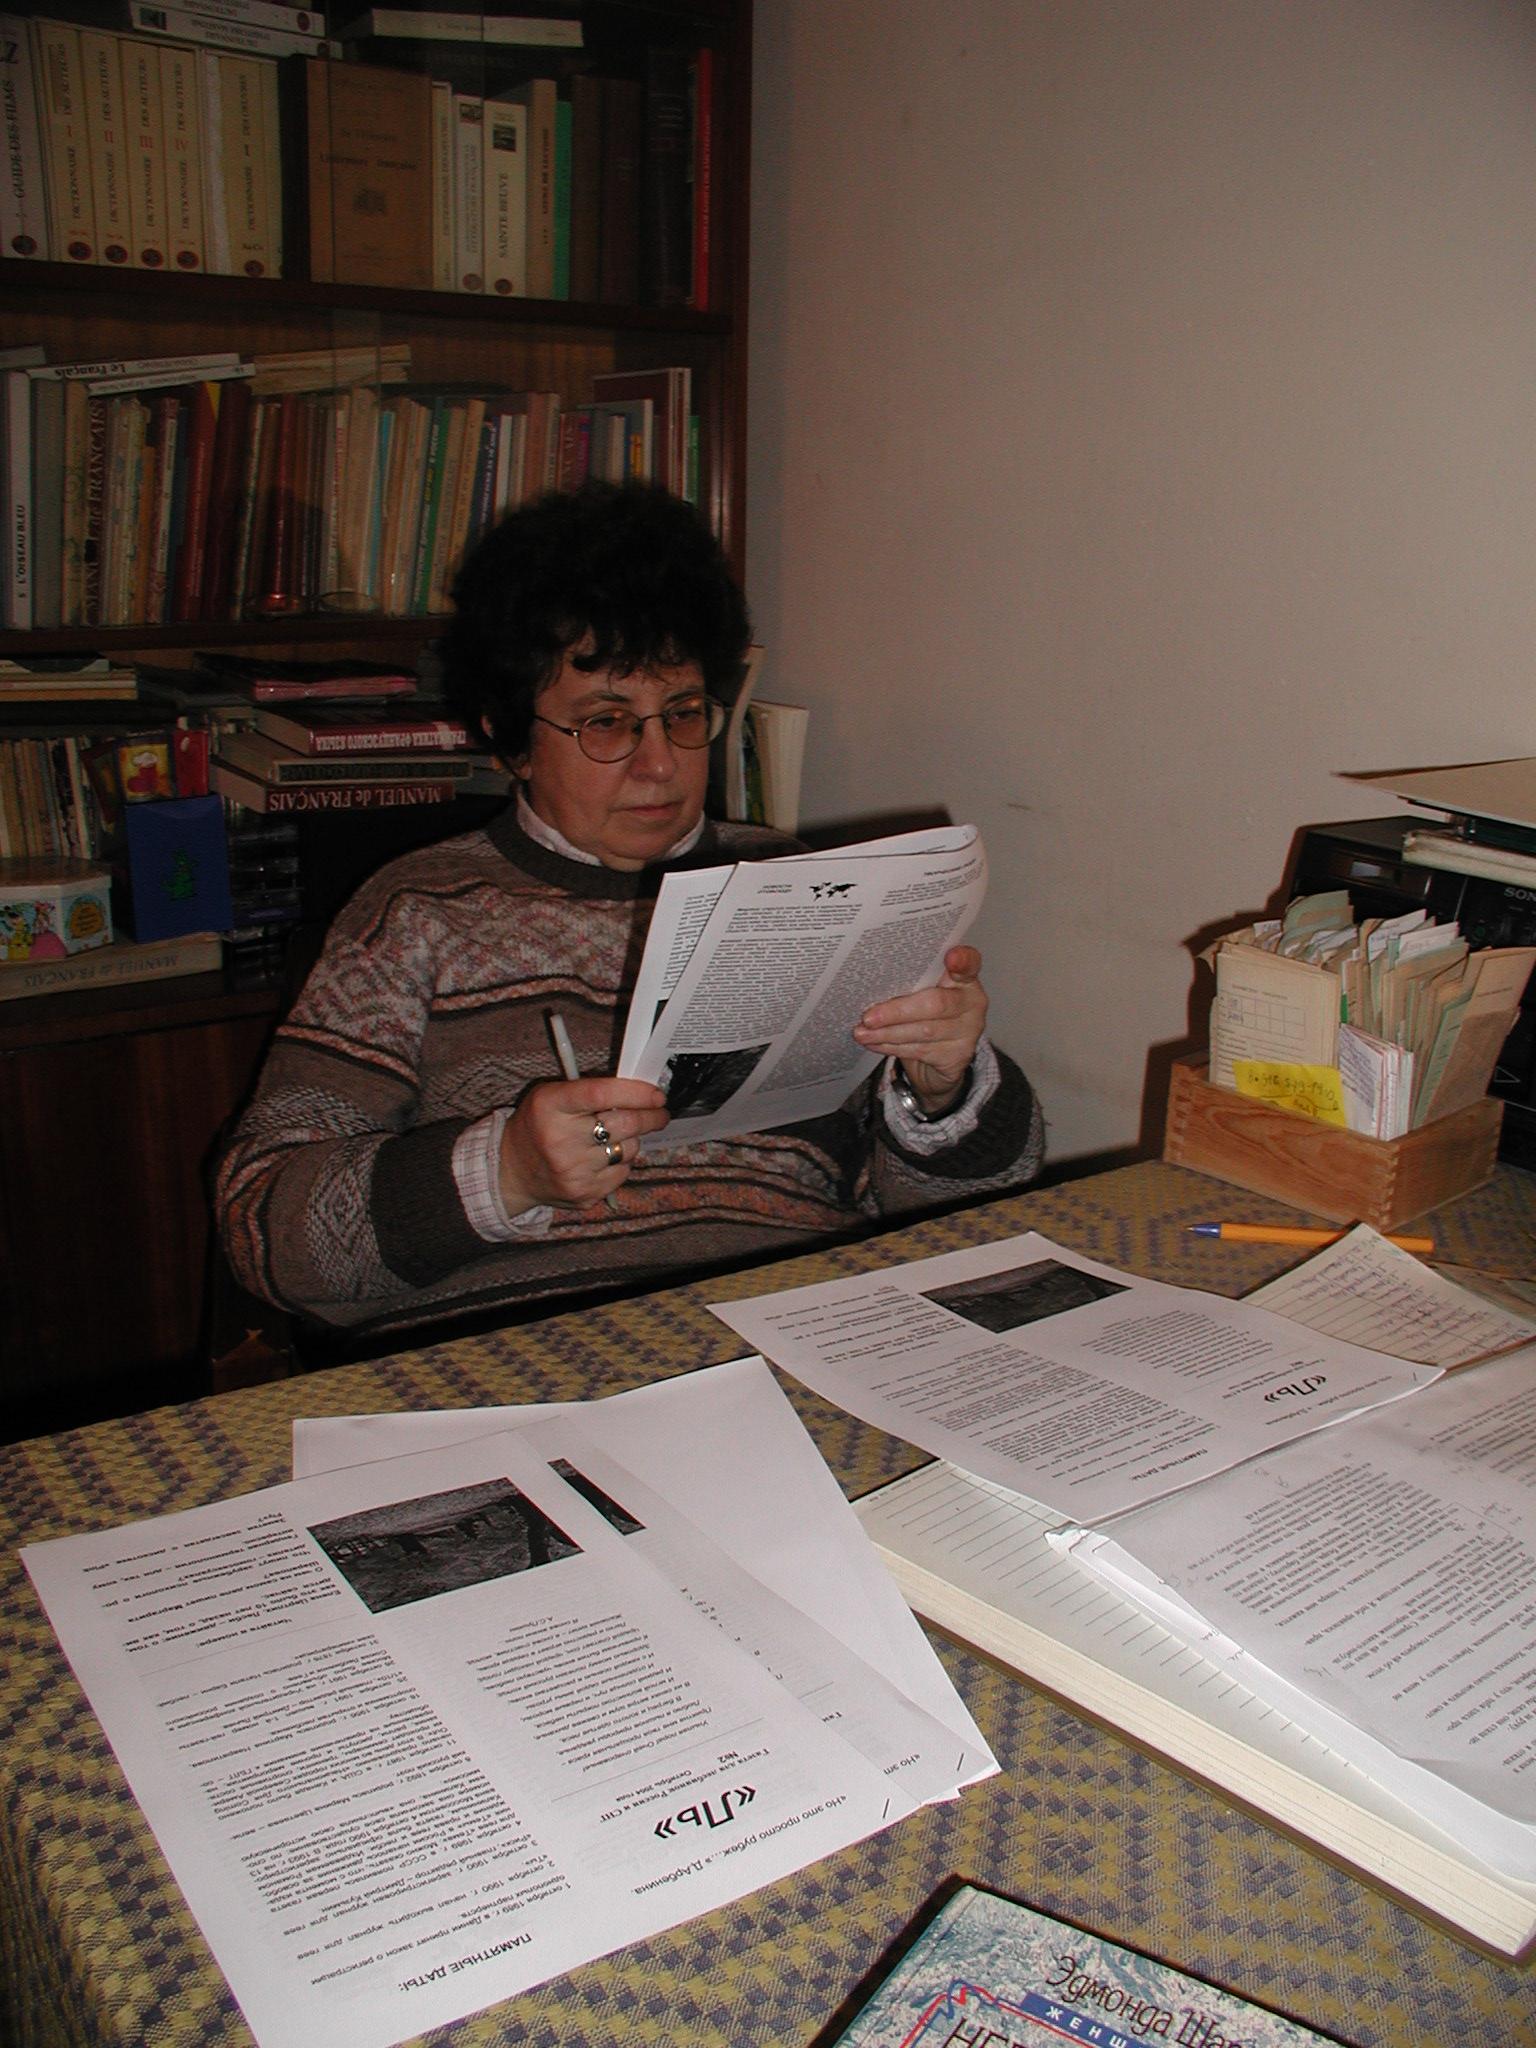 Елена Гусятинская (Архив лесбиянок и геев, Москва)